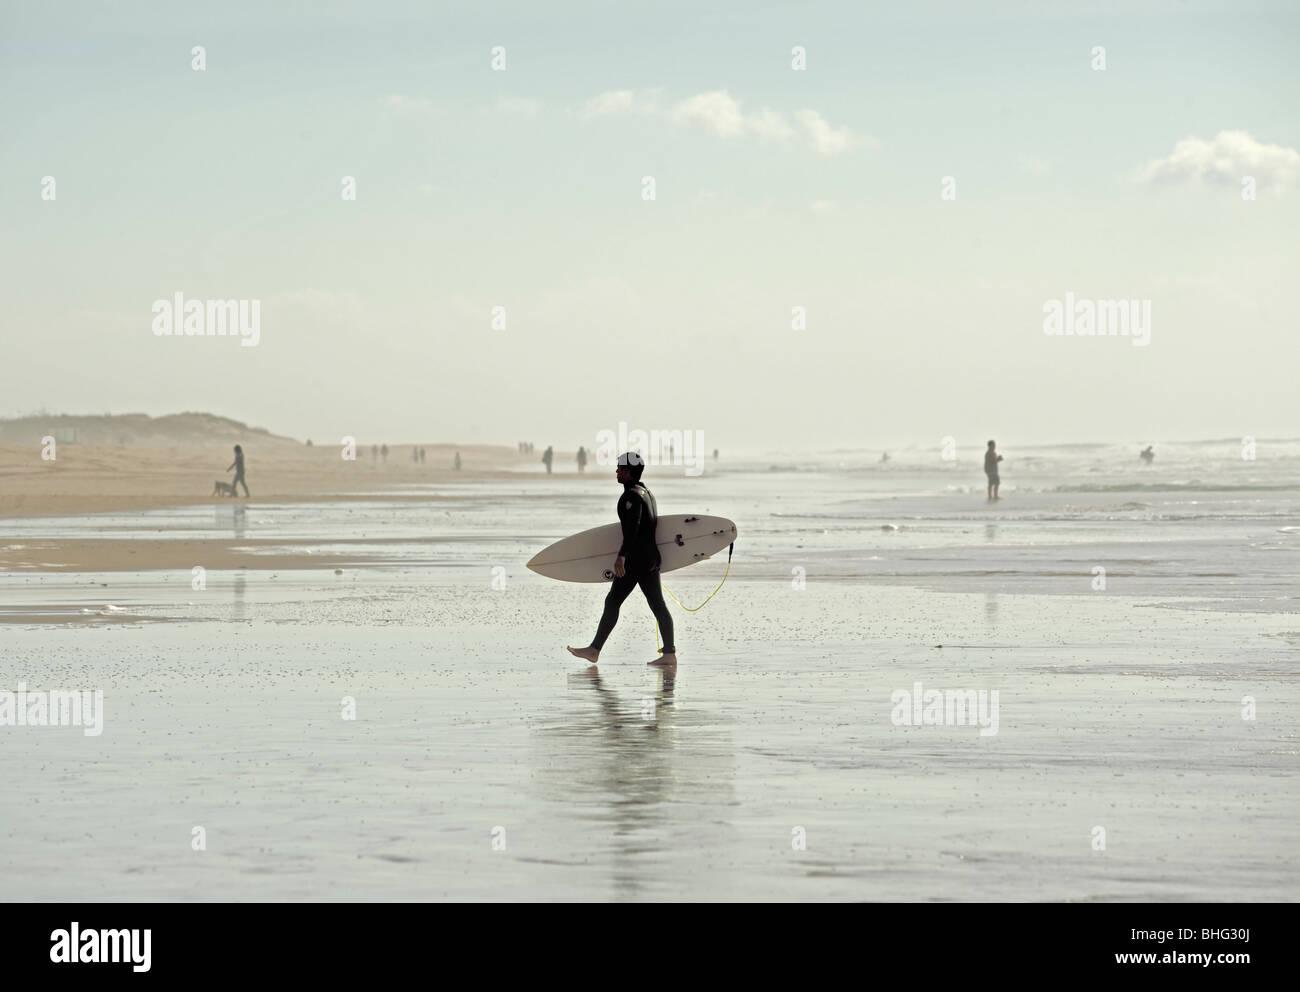 Surfer in el palmar Strand, Cádiz, Andalusien, Spanien Stockbild